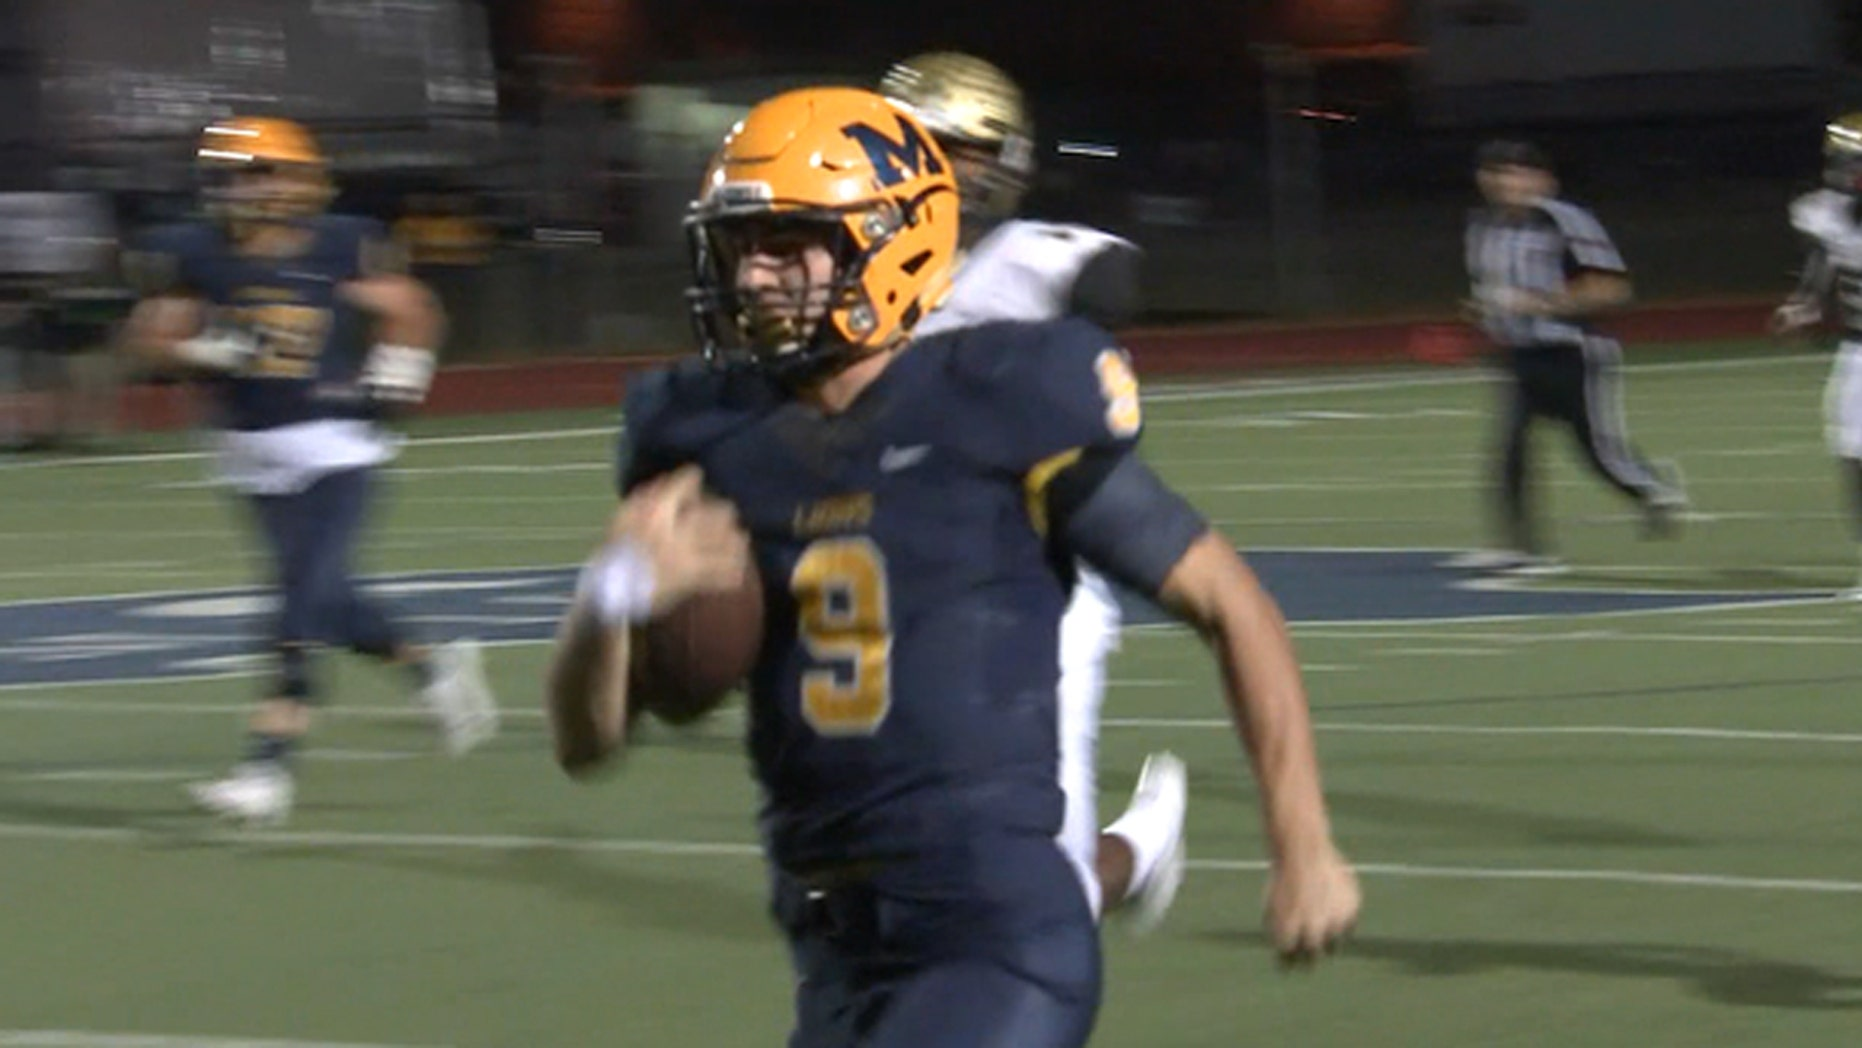 McKinney High School running back Matt Gadek set the Texas single-game rushing record with 599 yards.